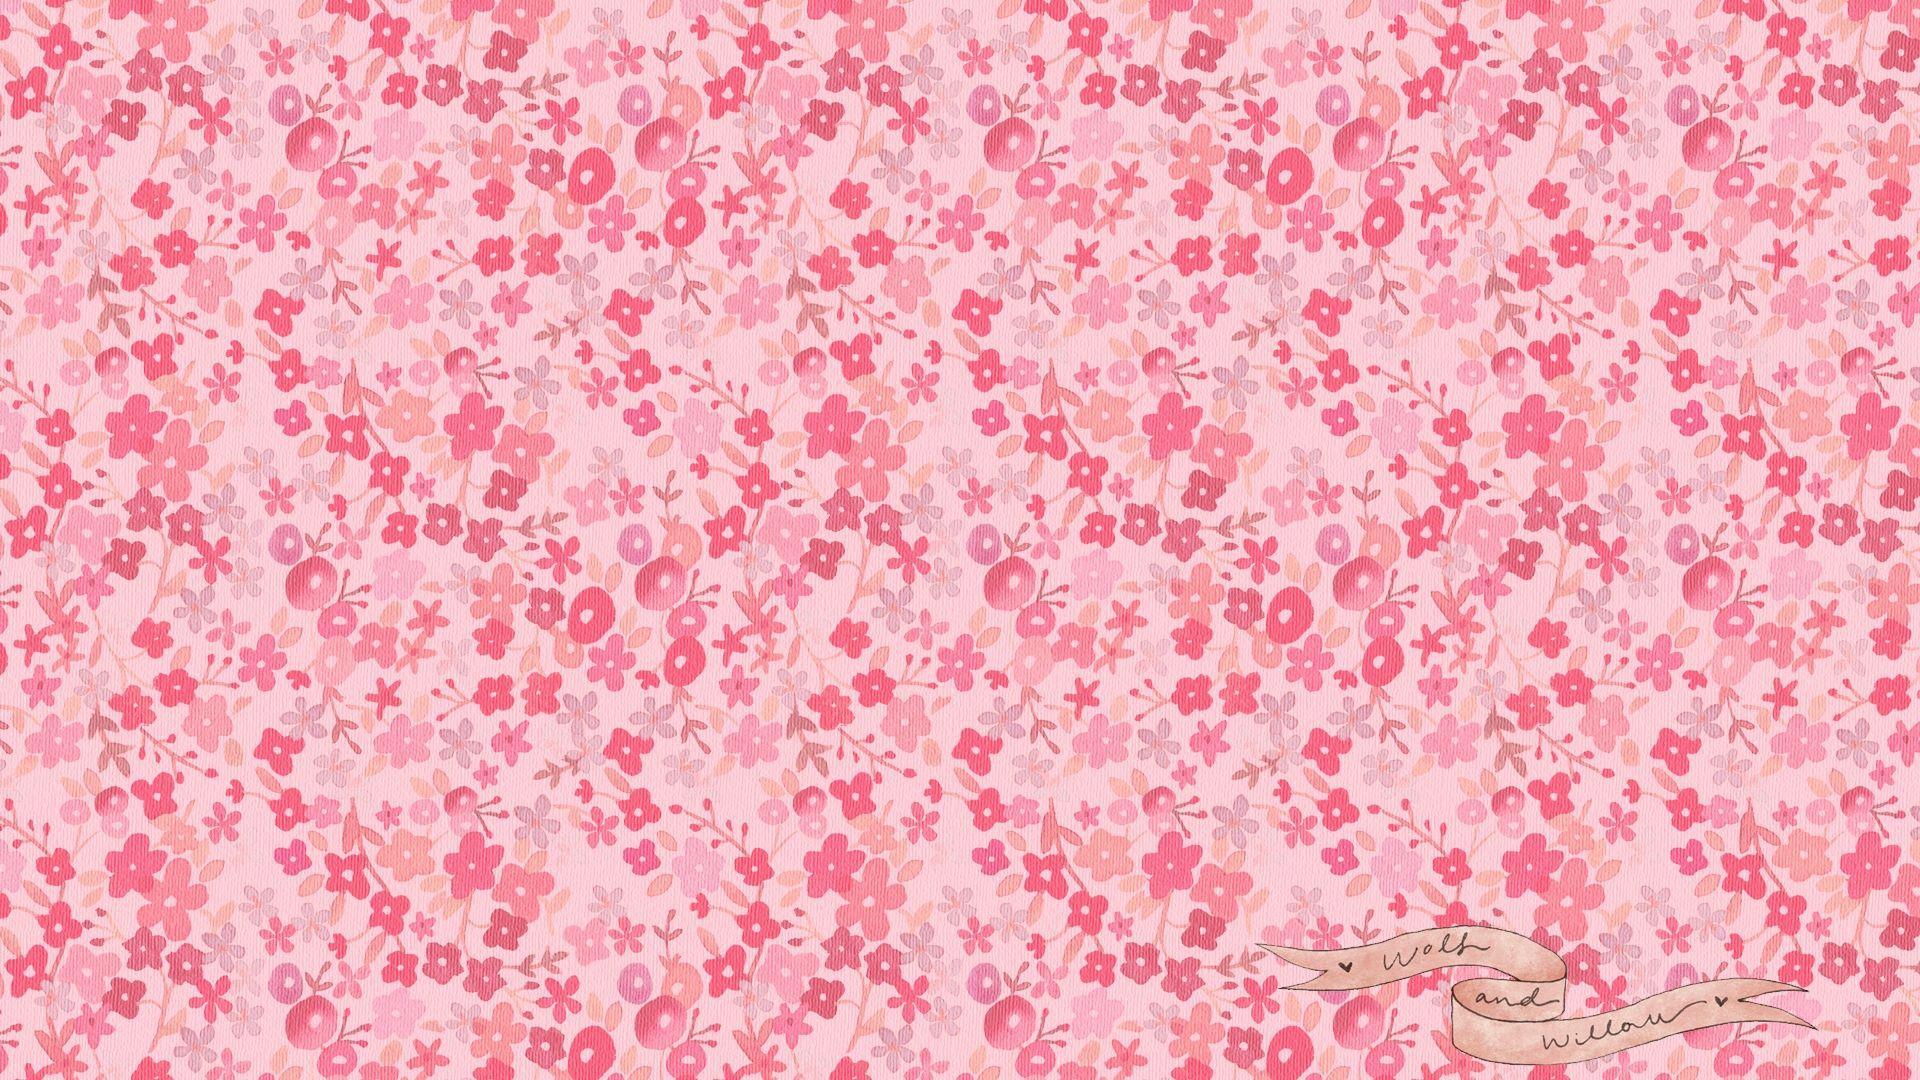 vintage pink 1920a—1080 vintage desktop wallpaper 1920x1080 wallpapers gallery